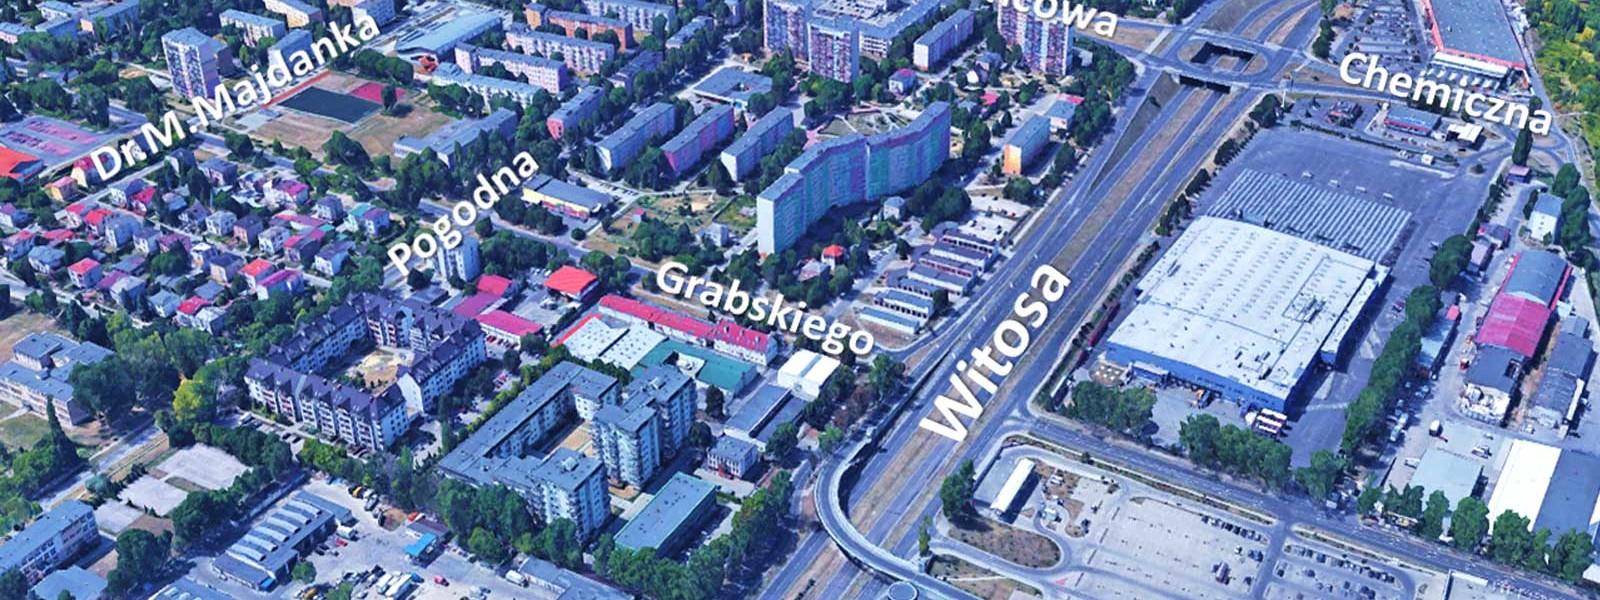 LUBLIN  Hala, Magazyn, Biura - TNGS Tomasz Karman - Biuro Obsługi Inwestora - Lublin